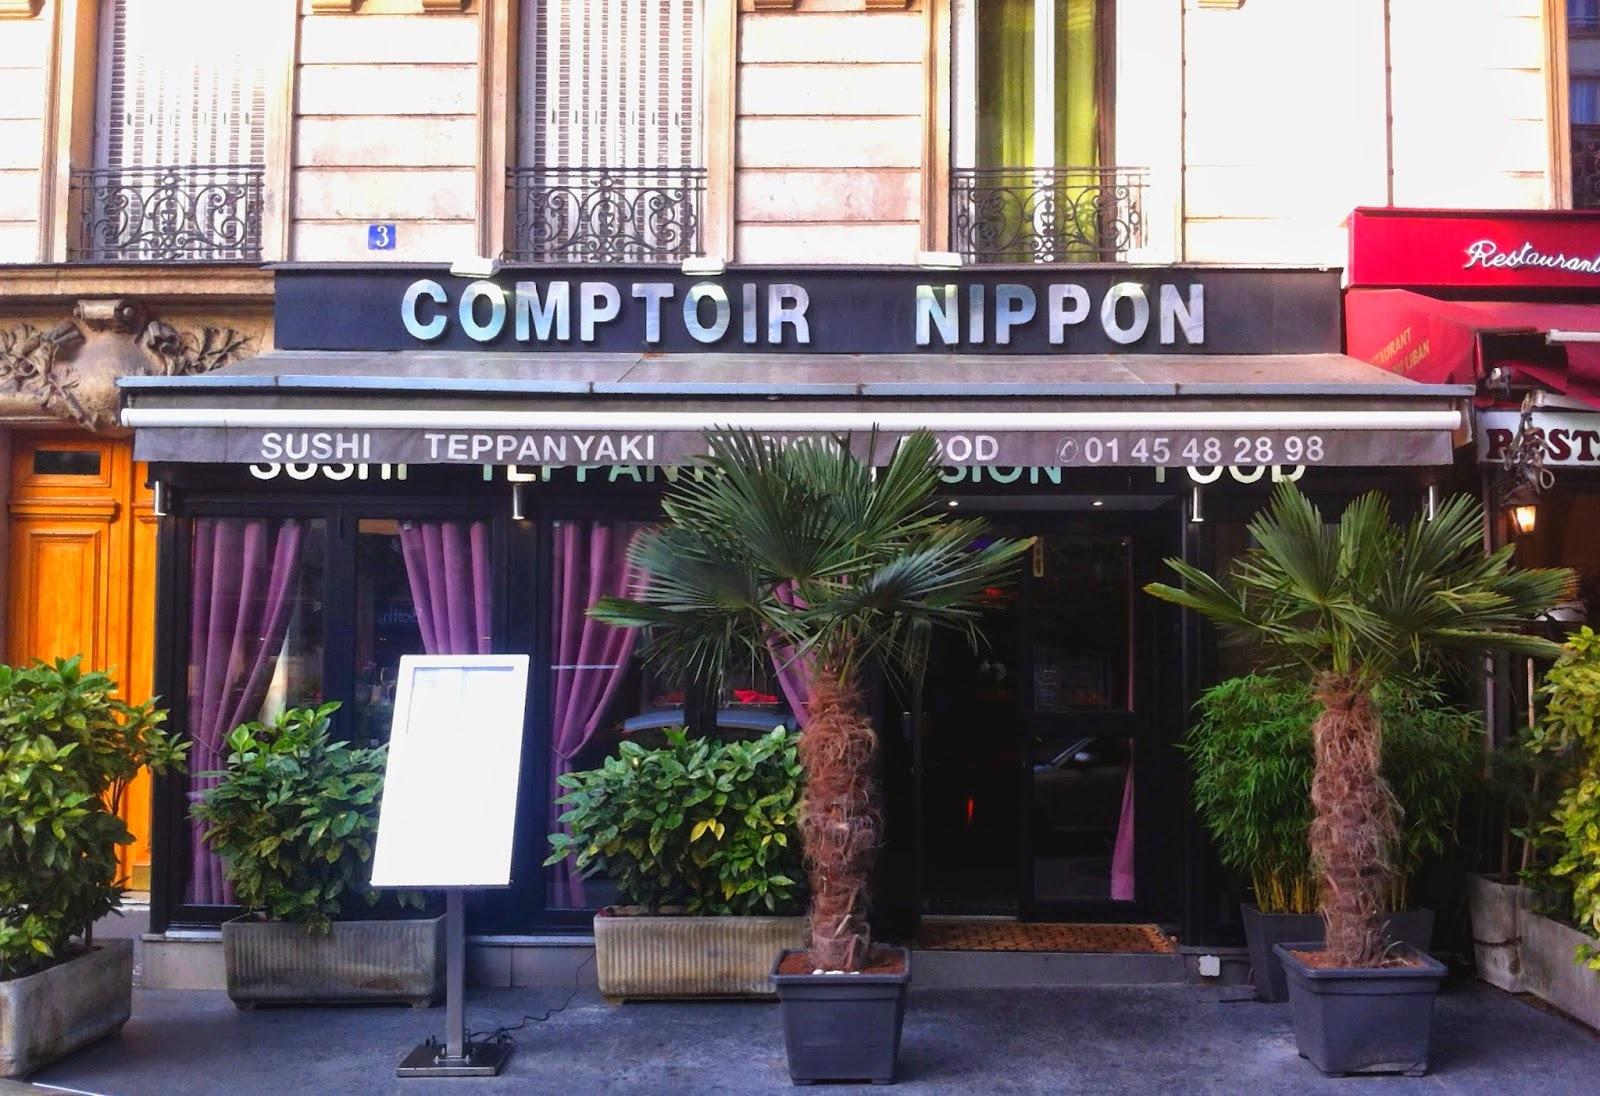 C122 - Au Comptoir Nippon